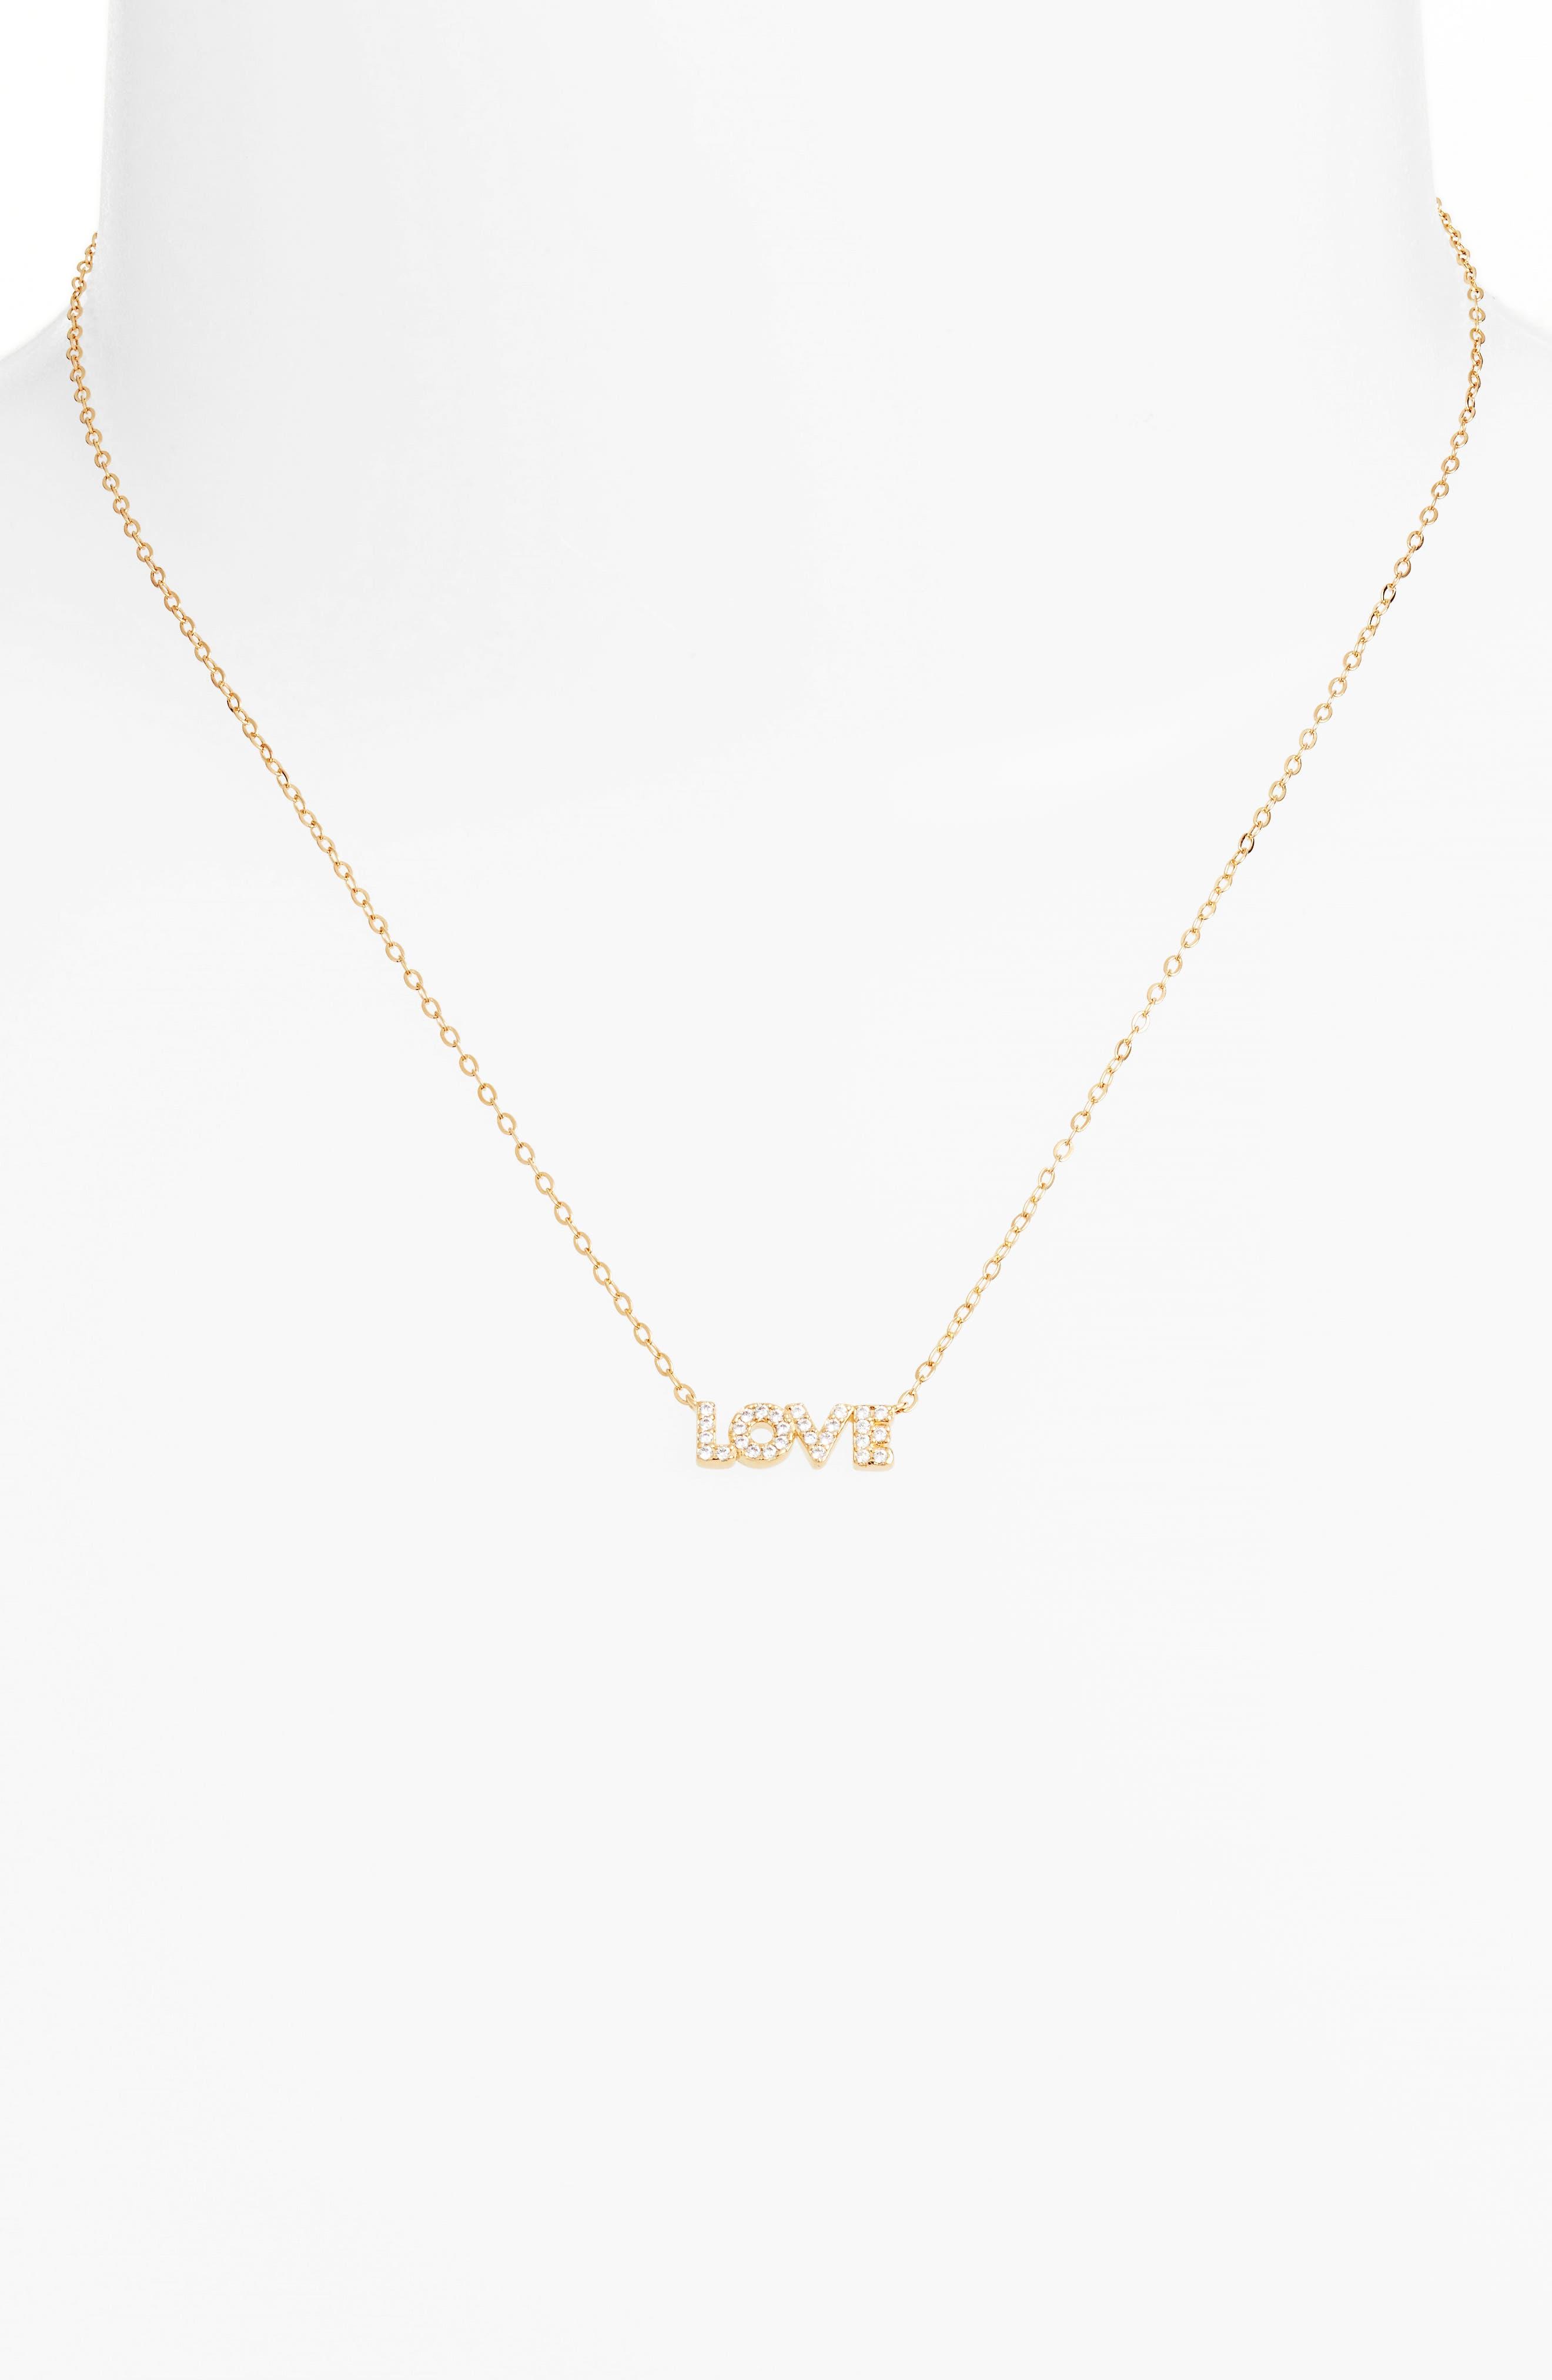 Sentimental Love Pendant Necklace,                             Alternate thumbnail 2, color,                             Gold